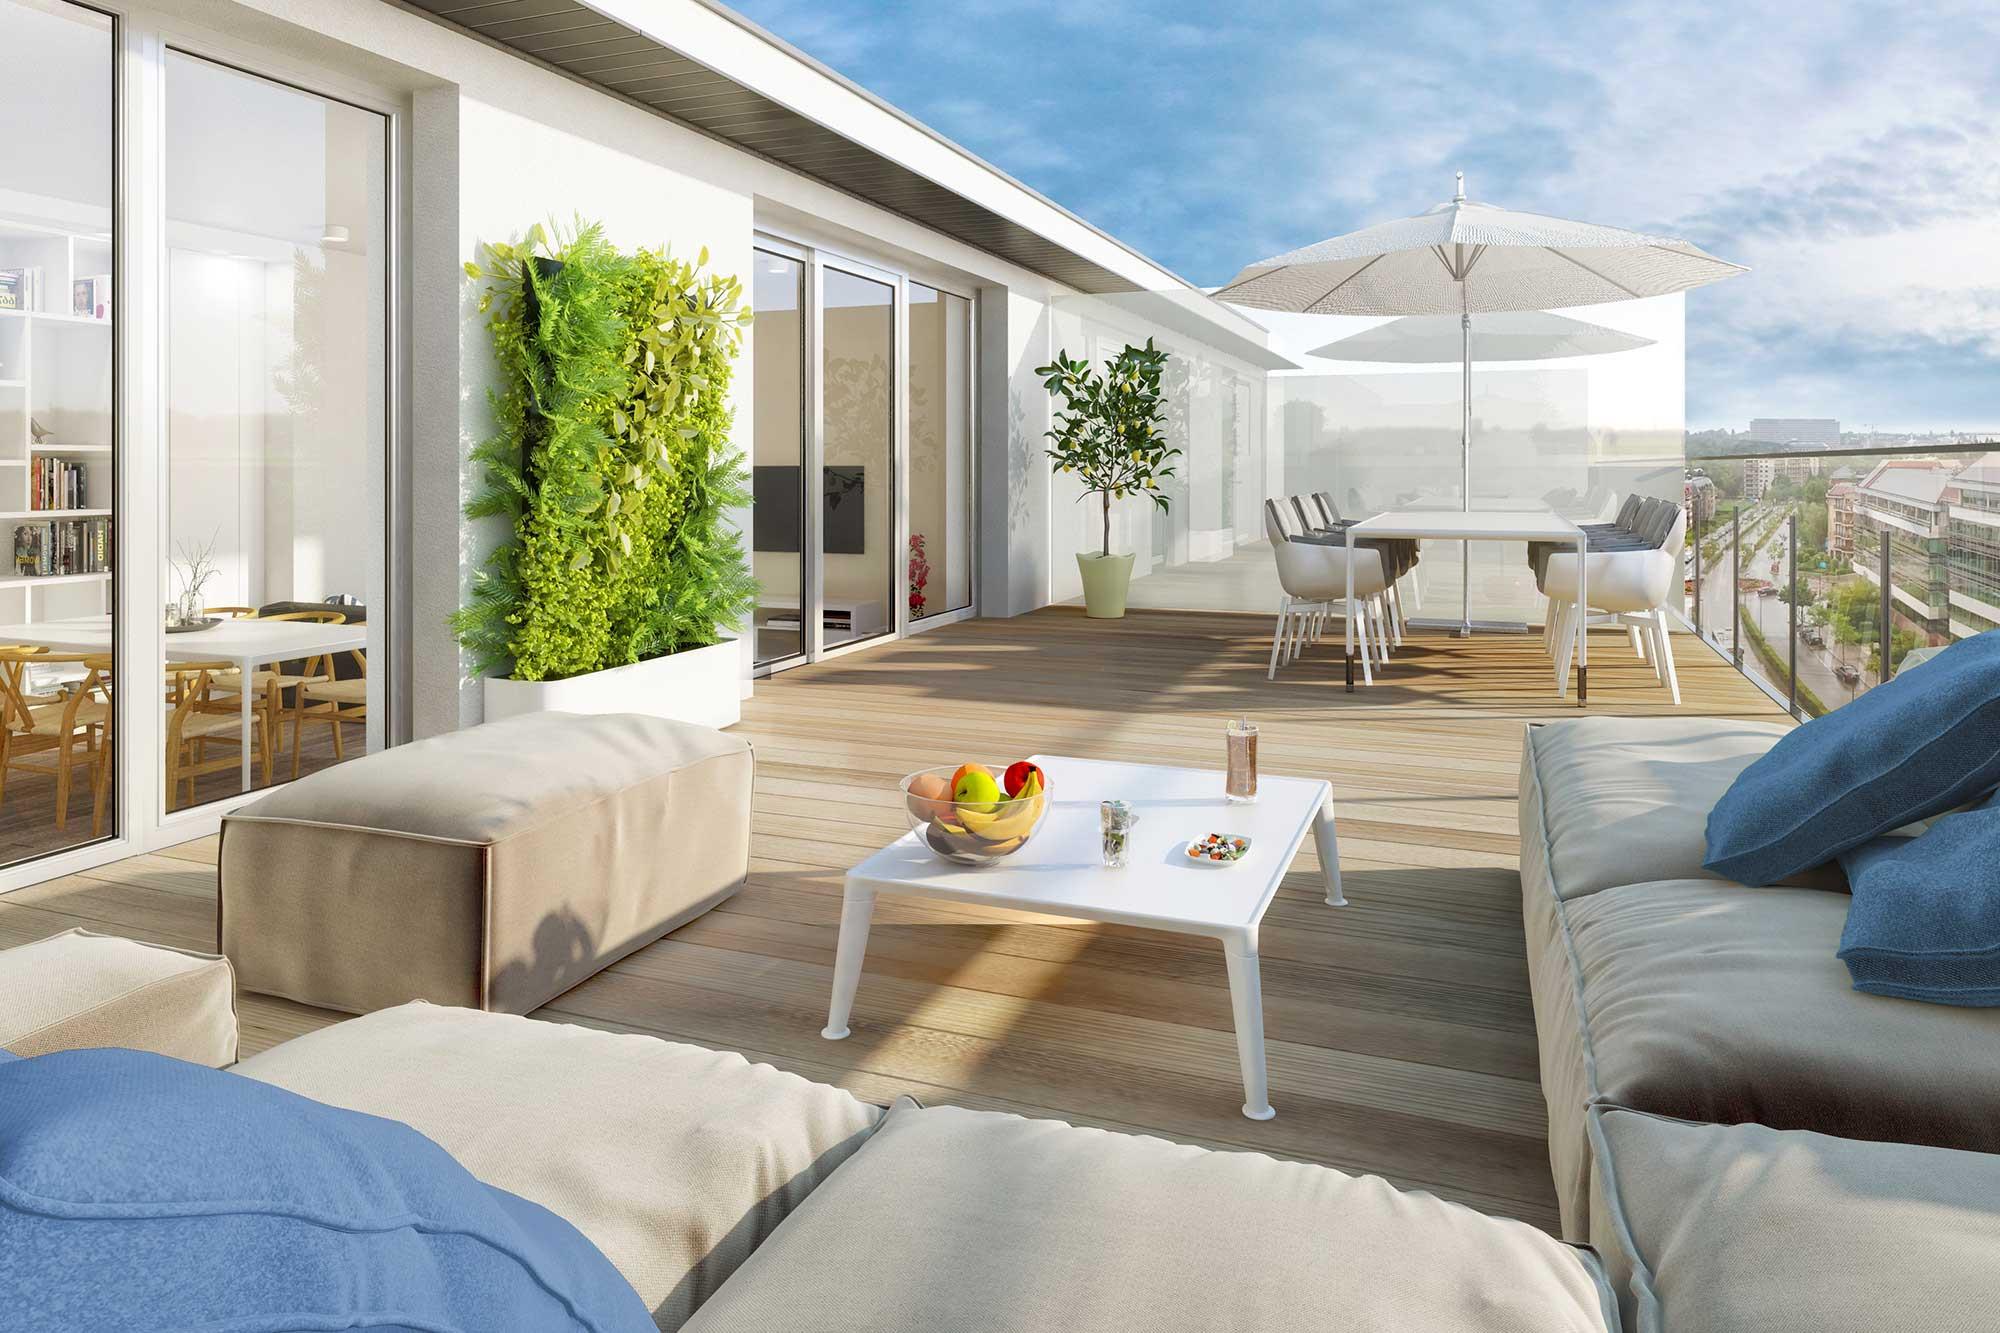 LesBalcons-Woluwe_detail-penthouse-terras.jpg